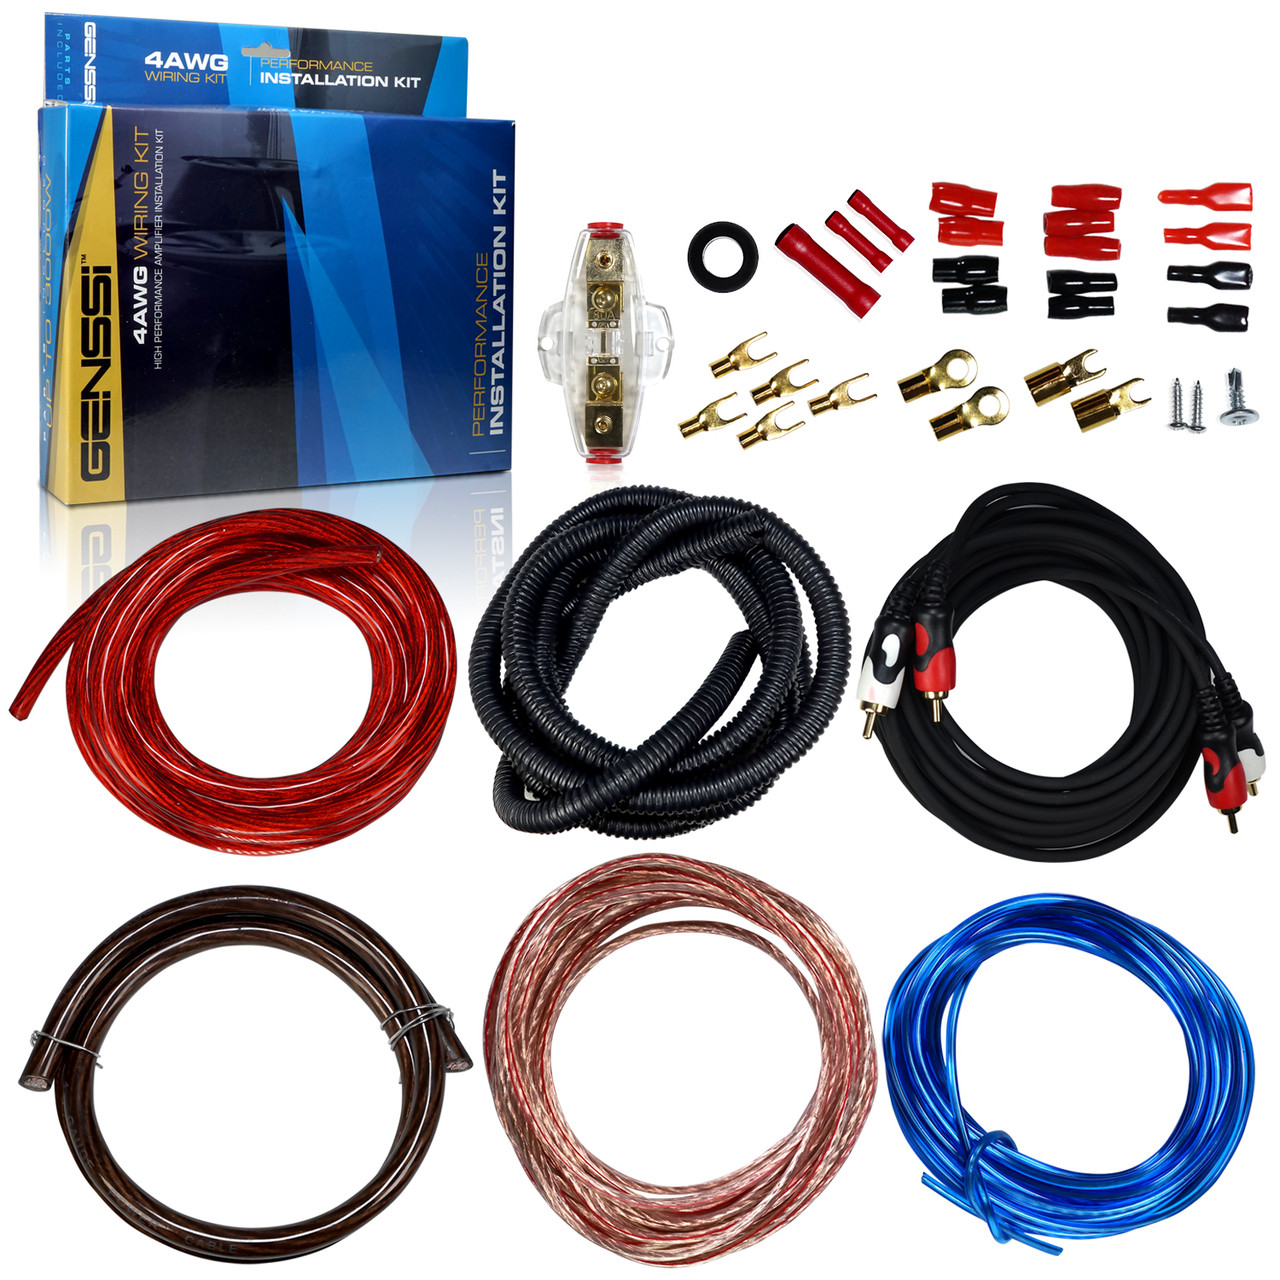 Scosche Kpa5d 1600 Watt 5 Awg Amp Wiring Kit Walmartcom Us Audio 4 Bullz Spak4bl Gauge Car Amplifier Ebay 4awg Installation